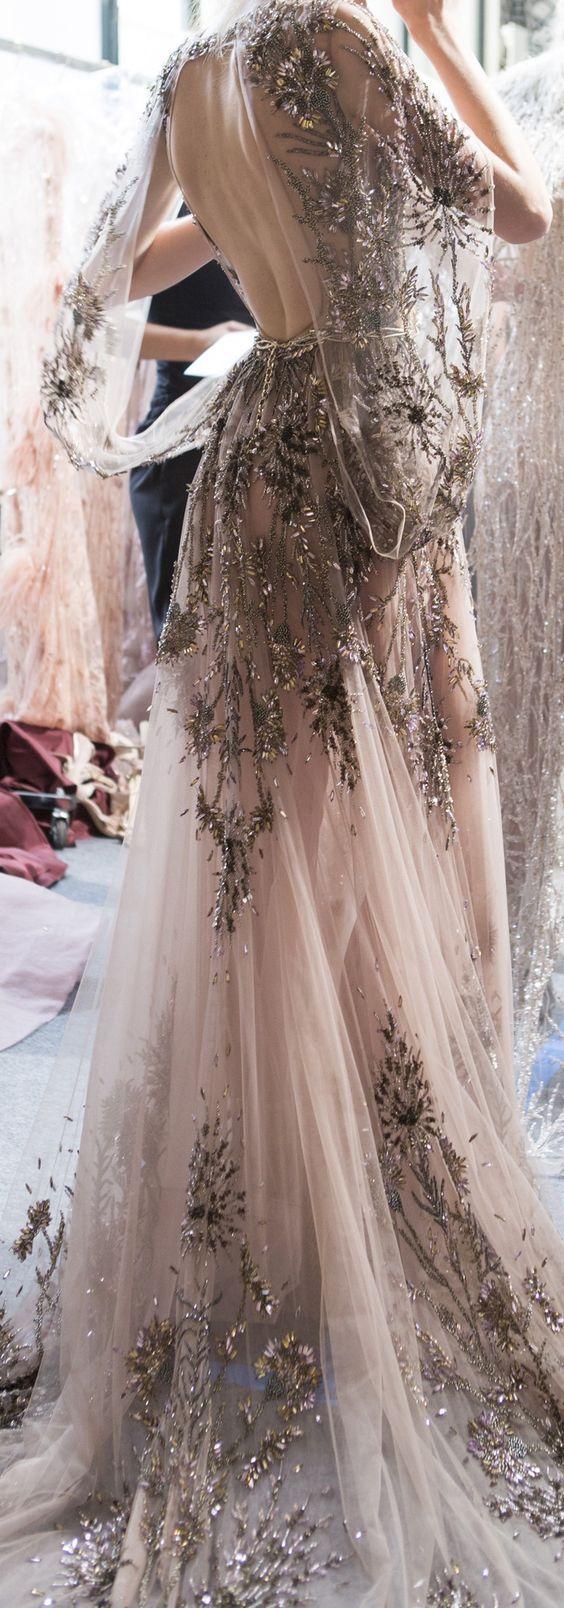 Zuhair Murad Fall 2017 Haute Couture